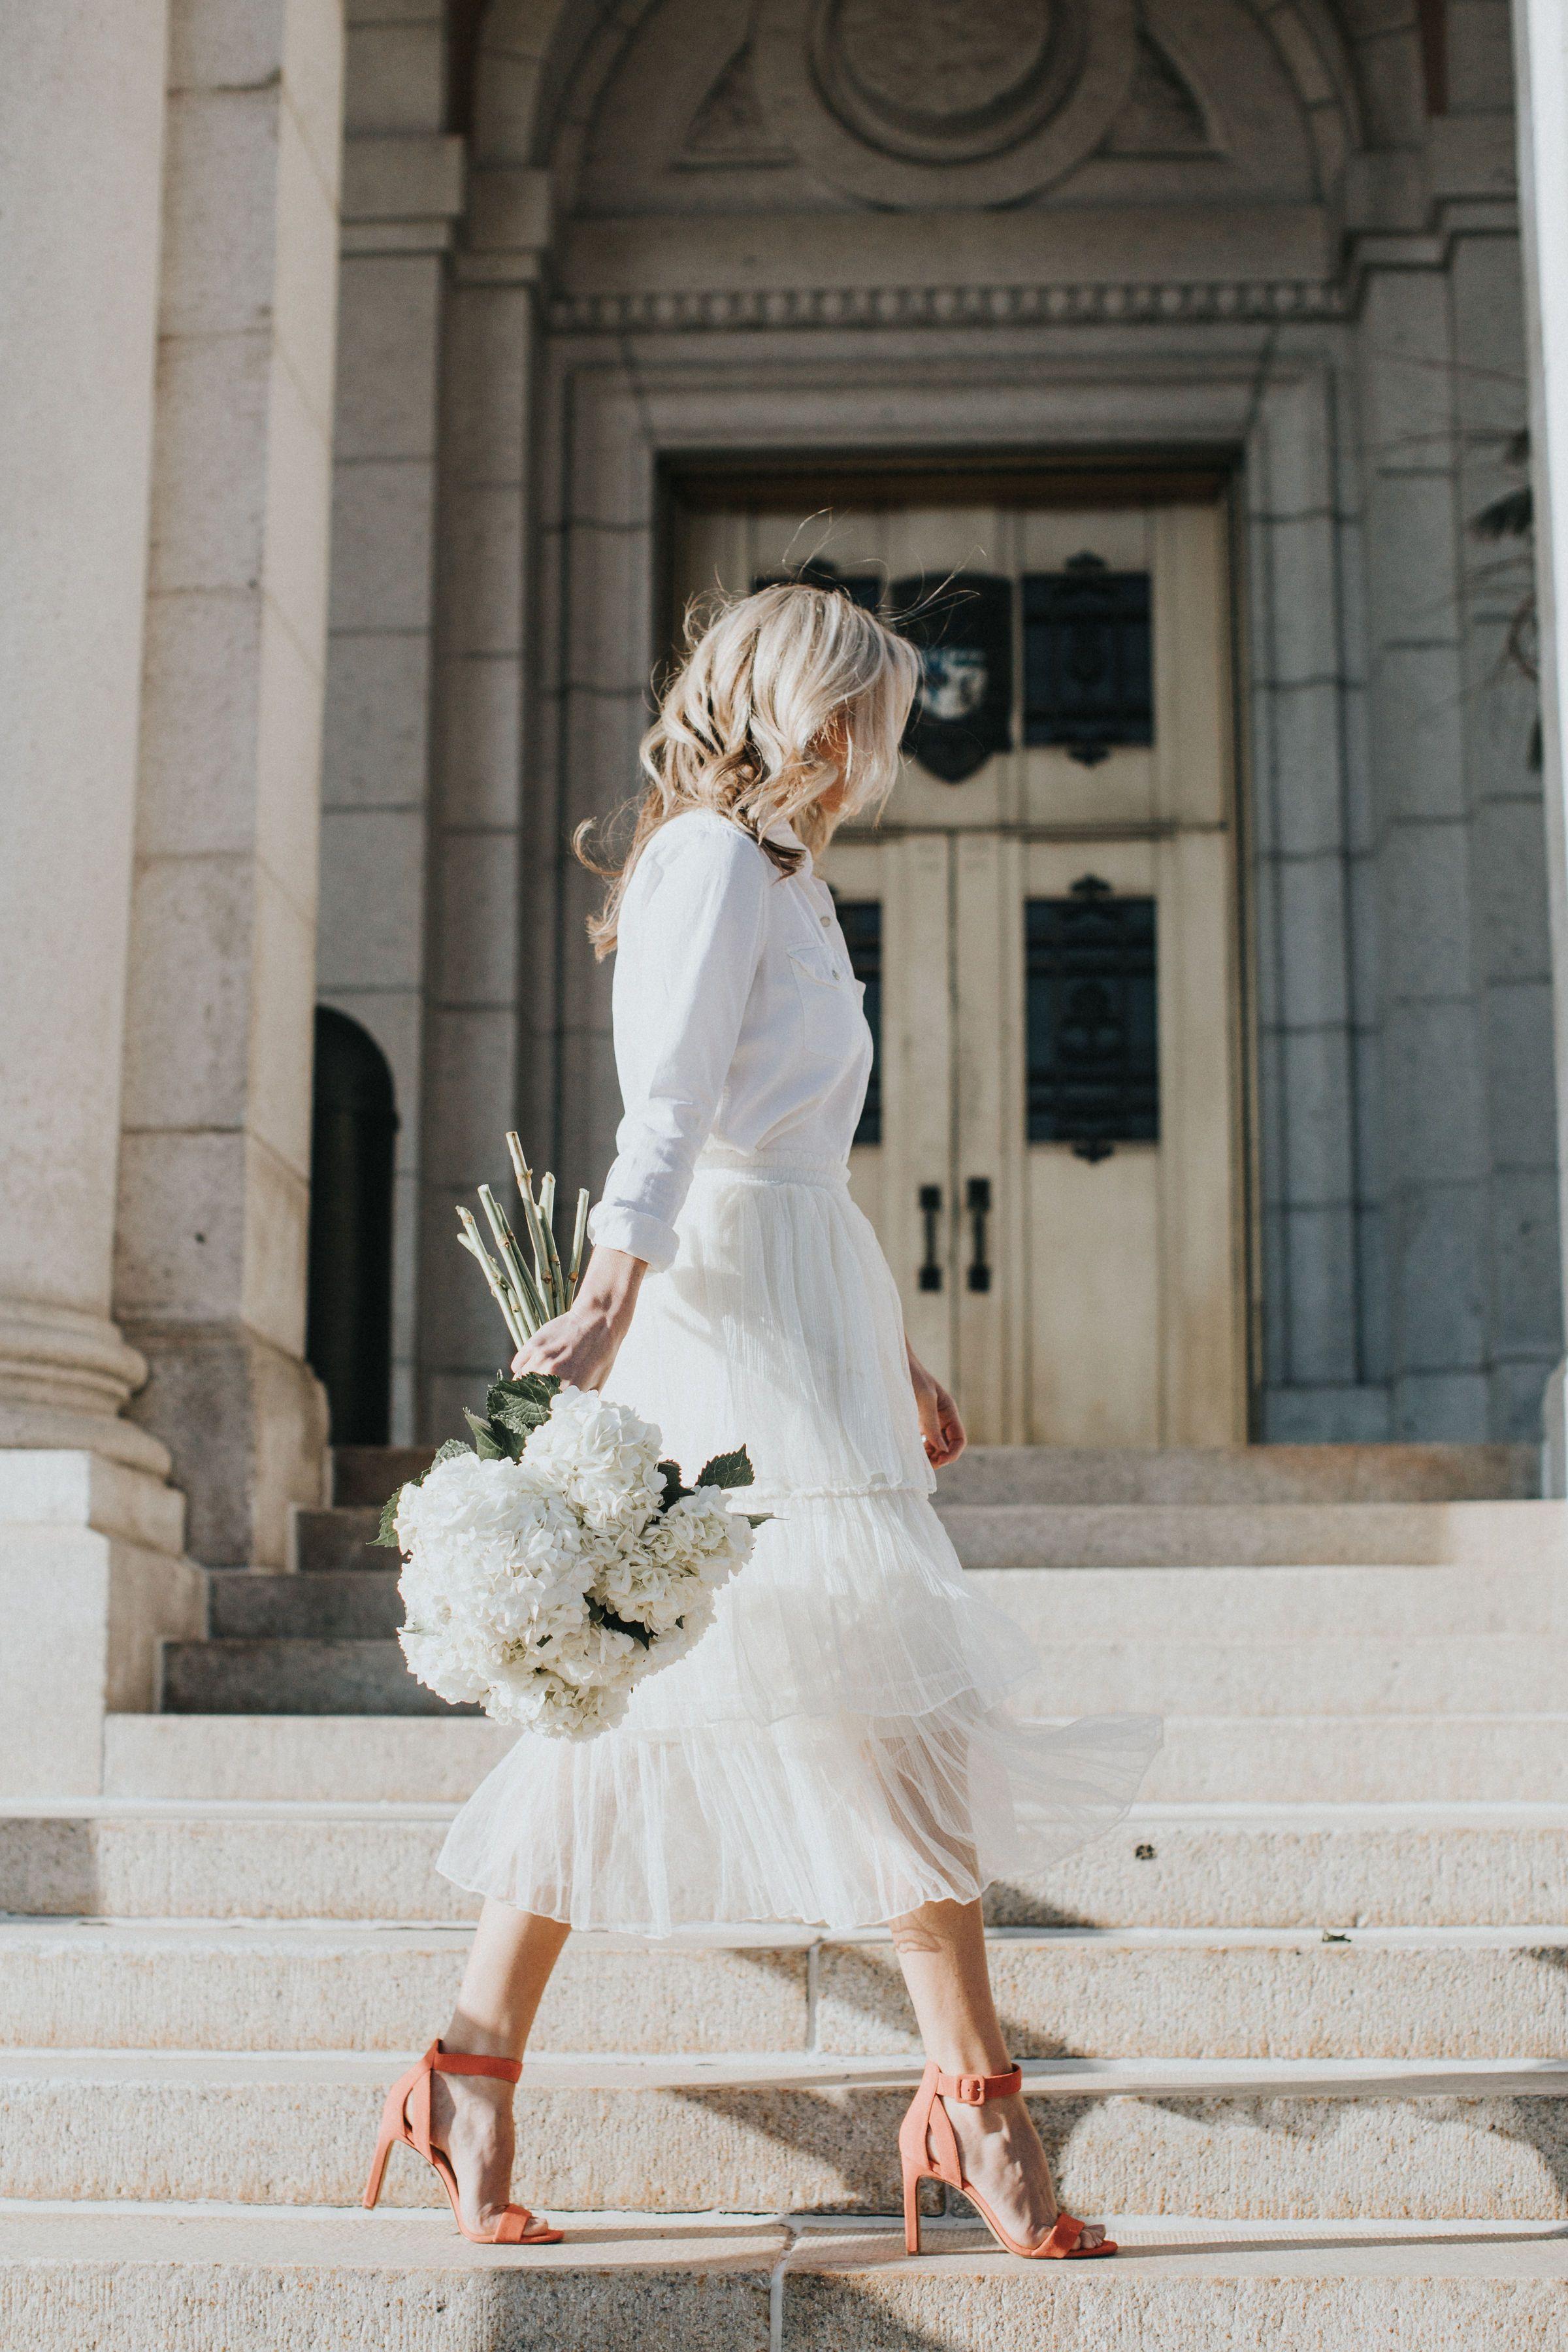 Vince Camuto Bevveyn Dsw Wedding Dress Guide Short Wedding Dress Modest Wedding Dresses With Sleeves [ 3600 x 2400 Pixel ]